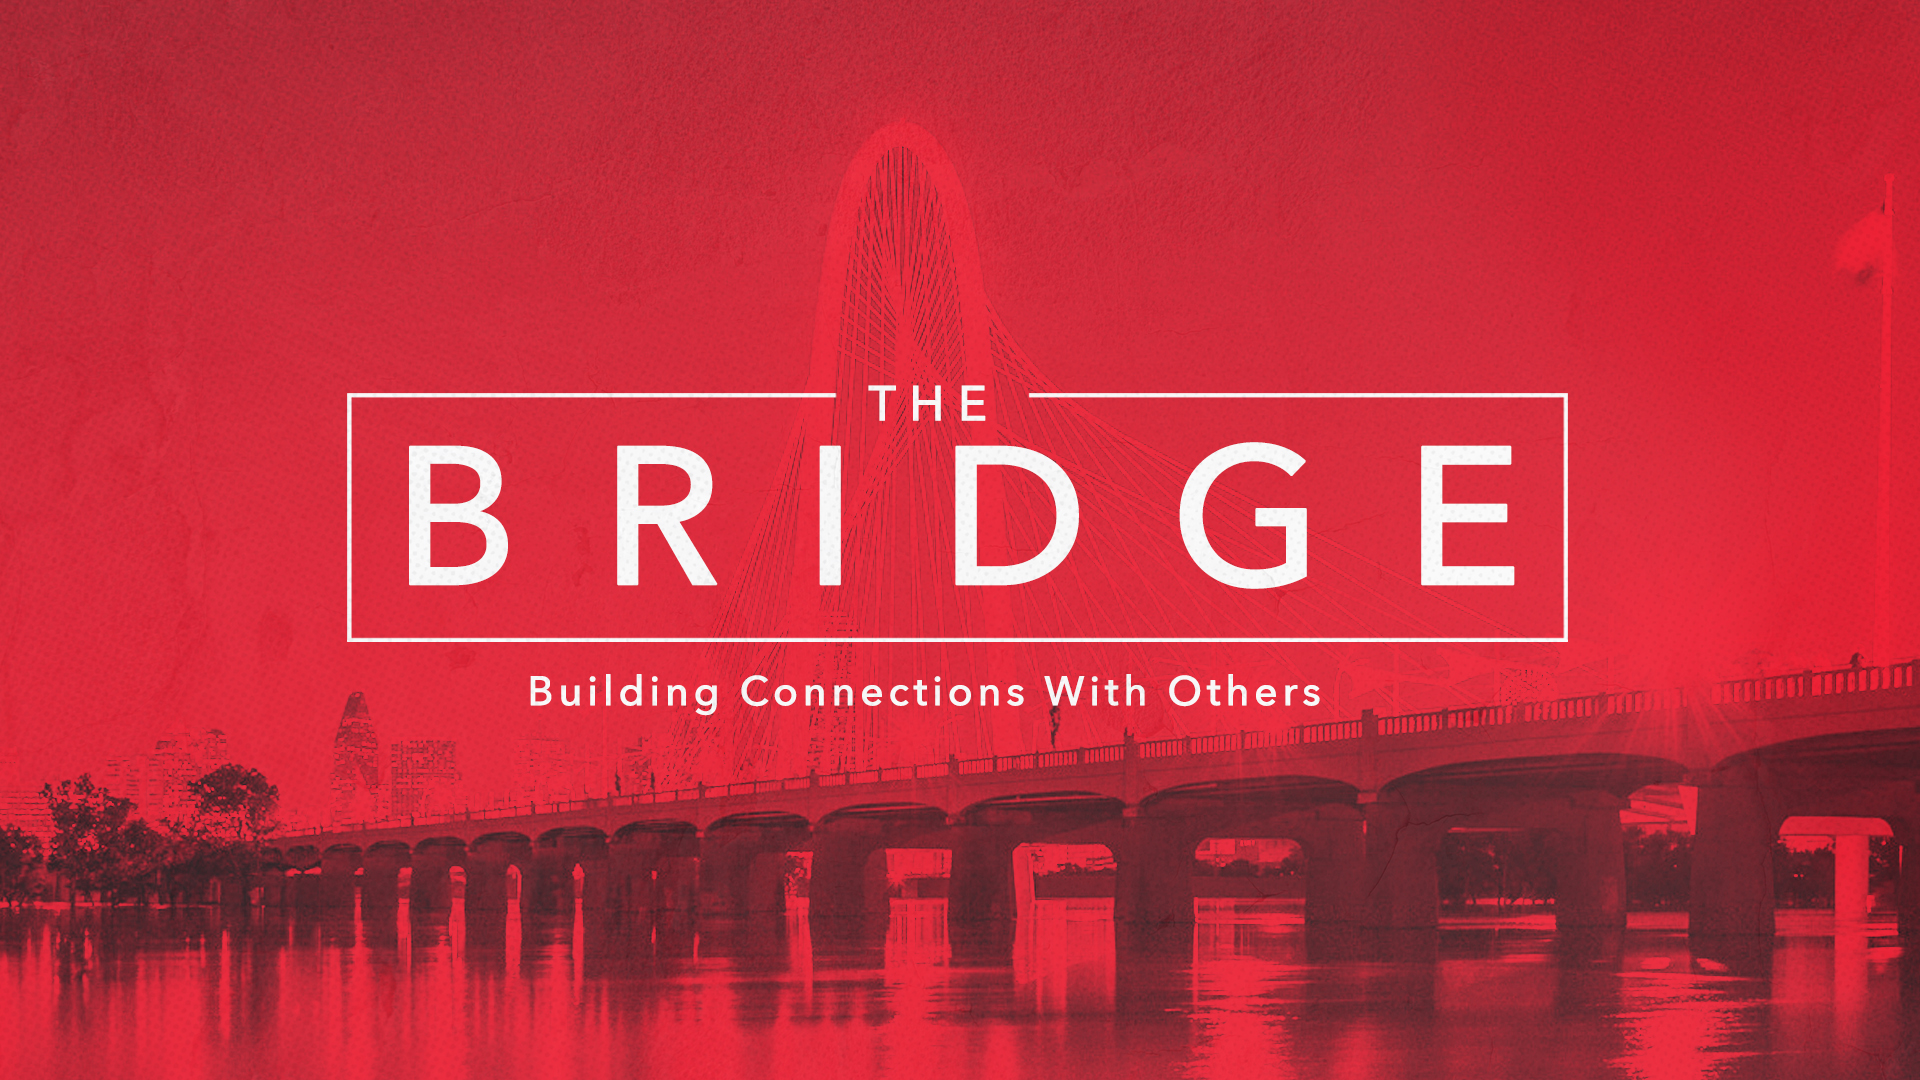 The Bridge -  October 2016 -November 2016